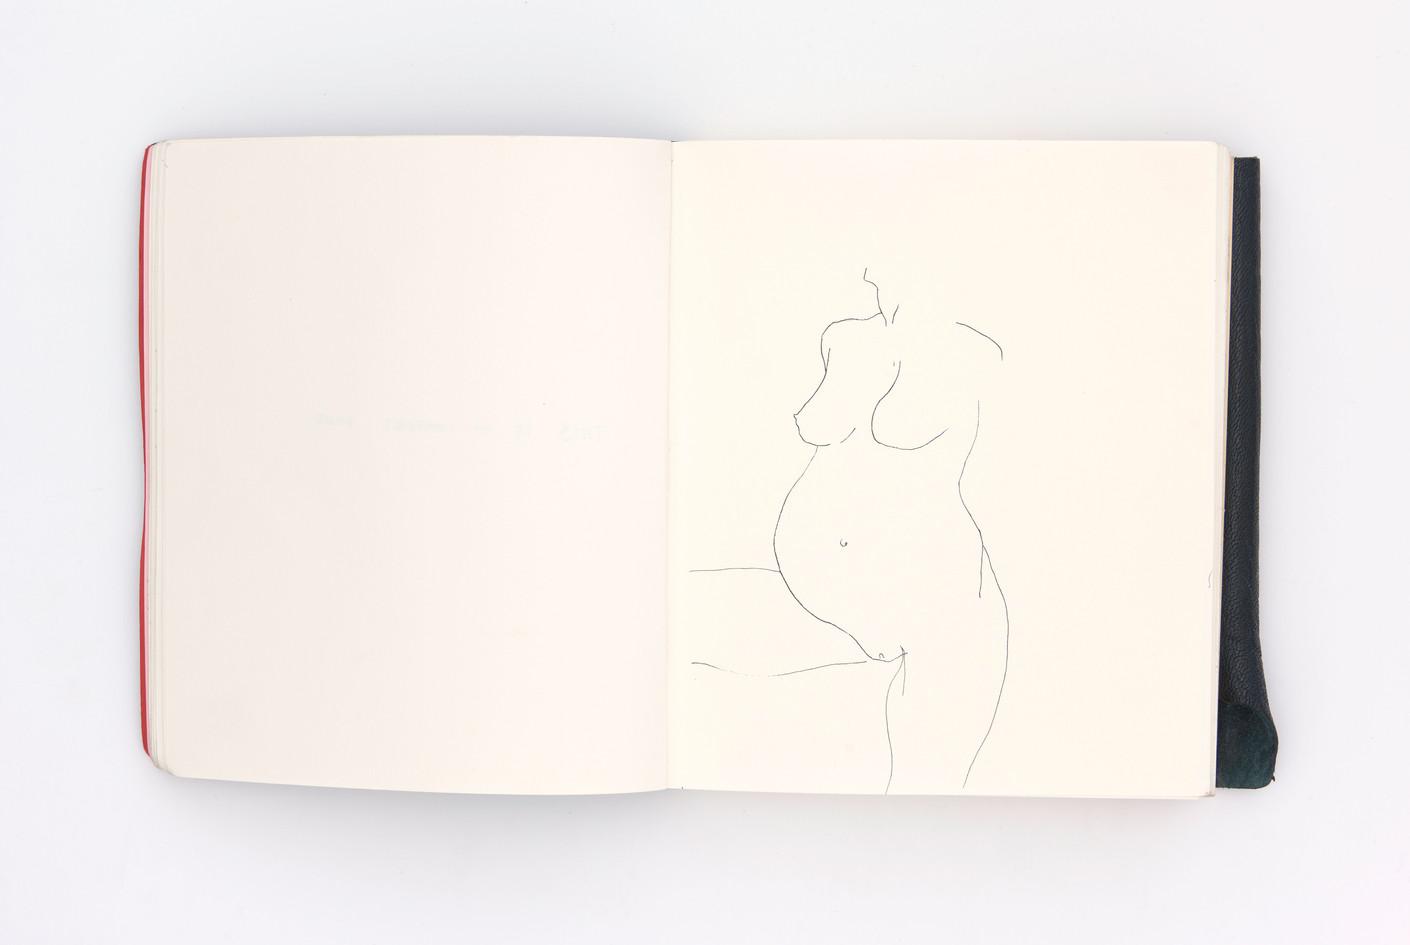 LargerBook-011.jpg